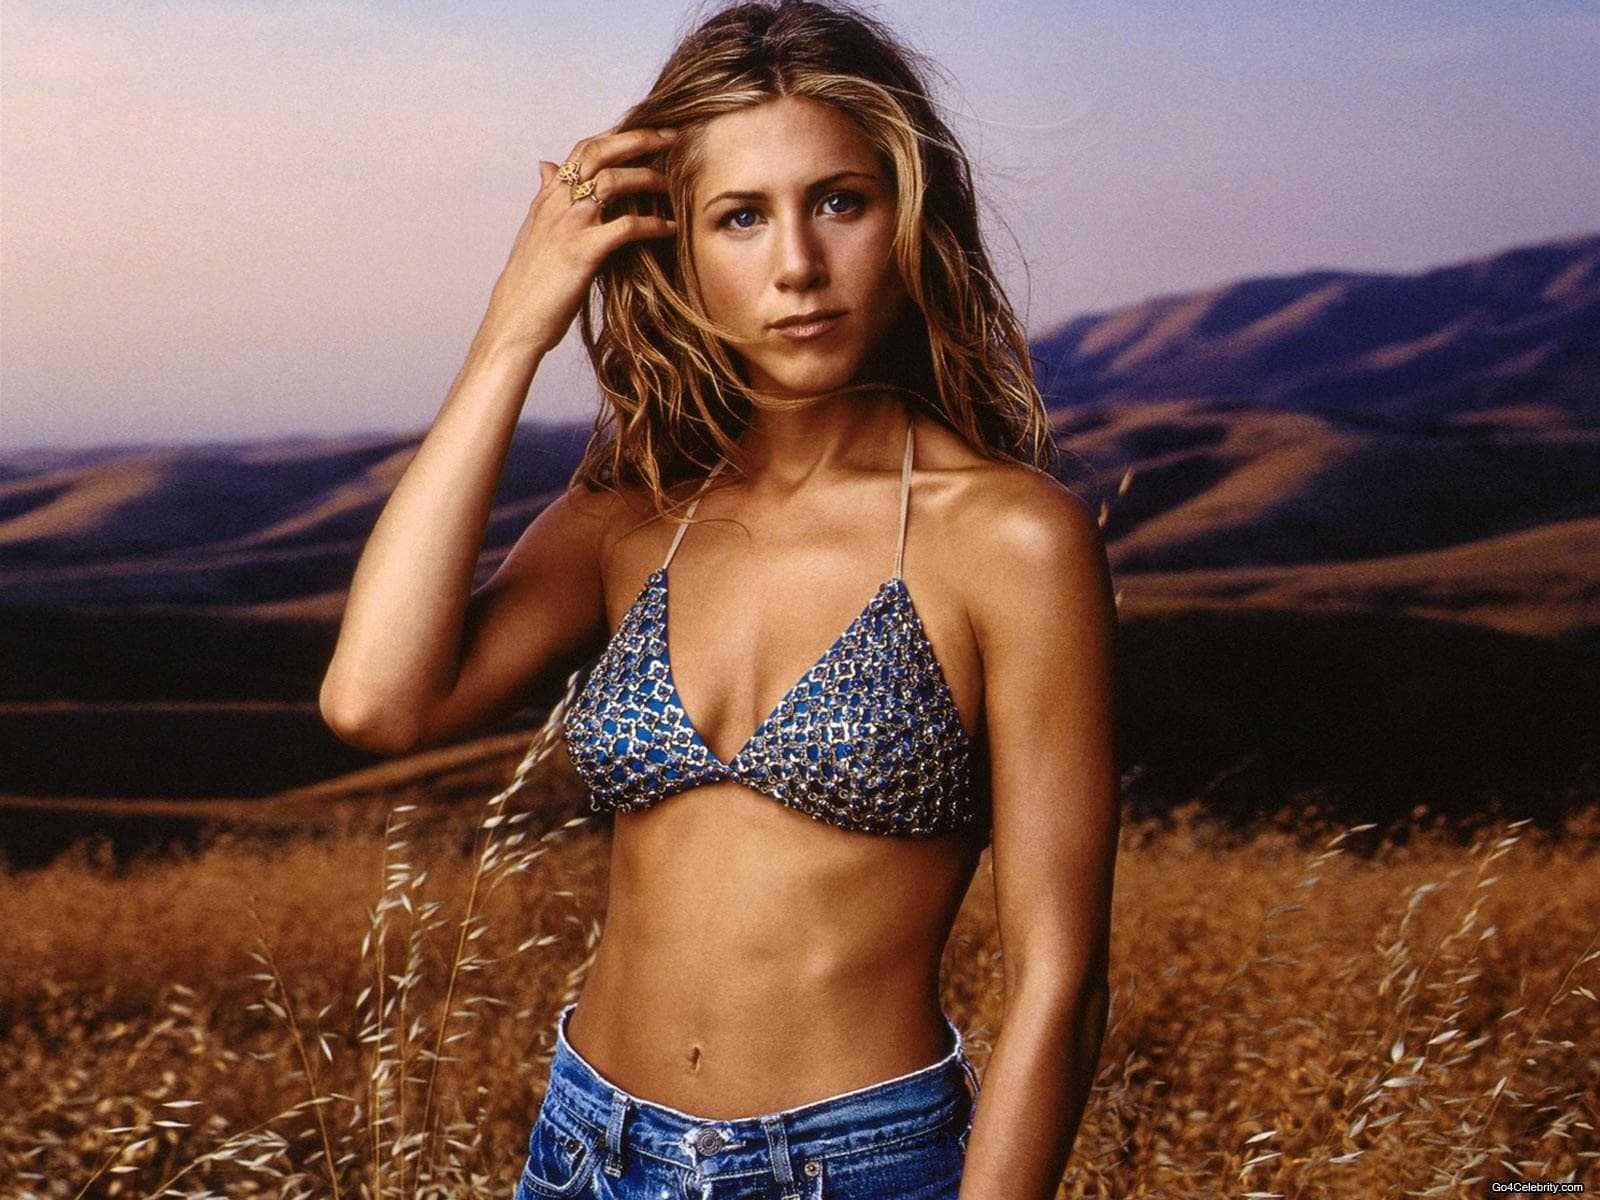 Jennifer Aniston hot bikini pic